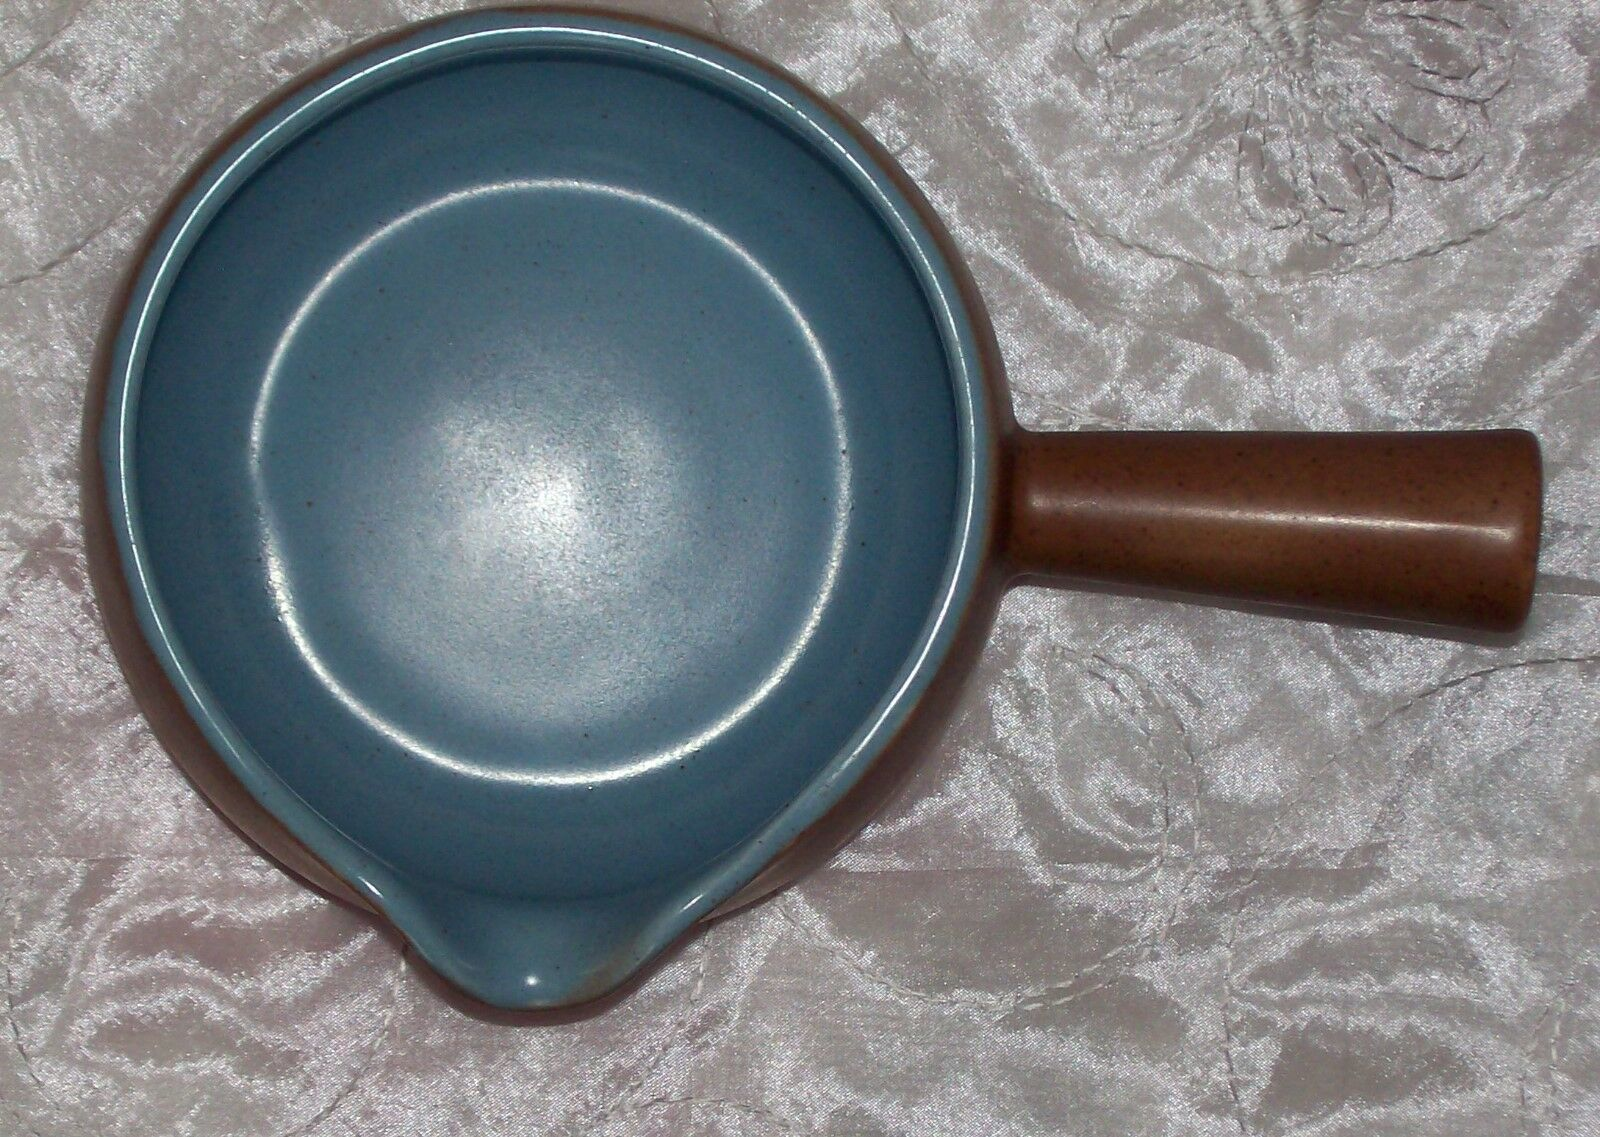 Metlox Poppytrail CALIFORNIA TEMPO BLUE Gravy / Sauce Boat EUC image 6